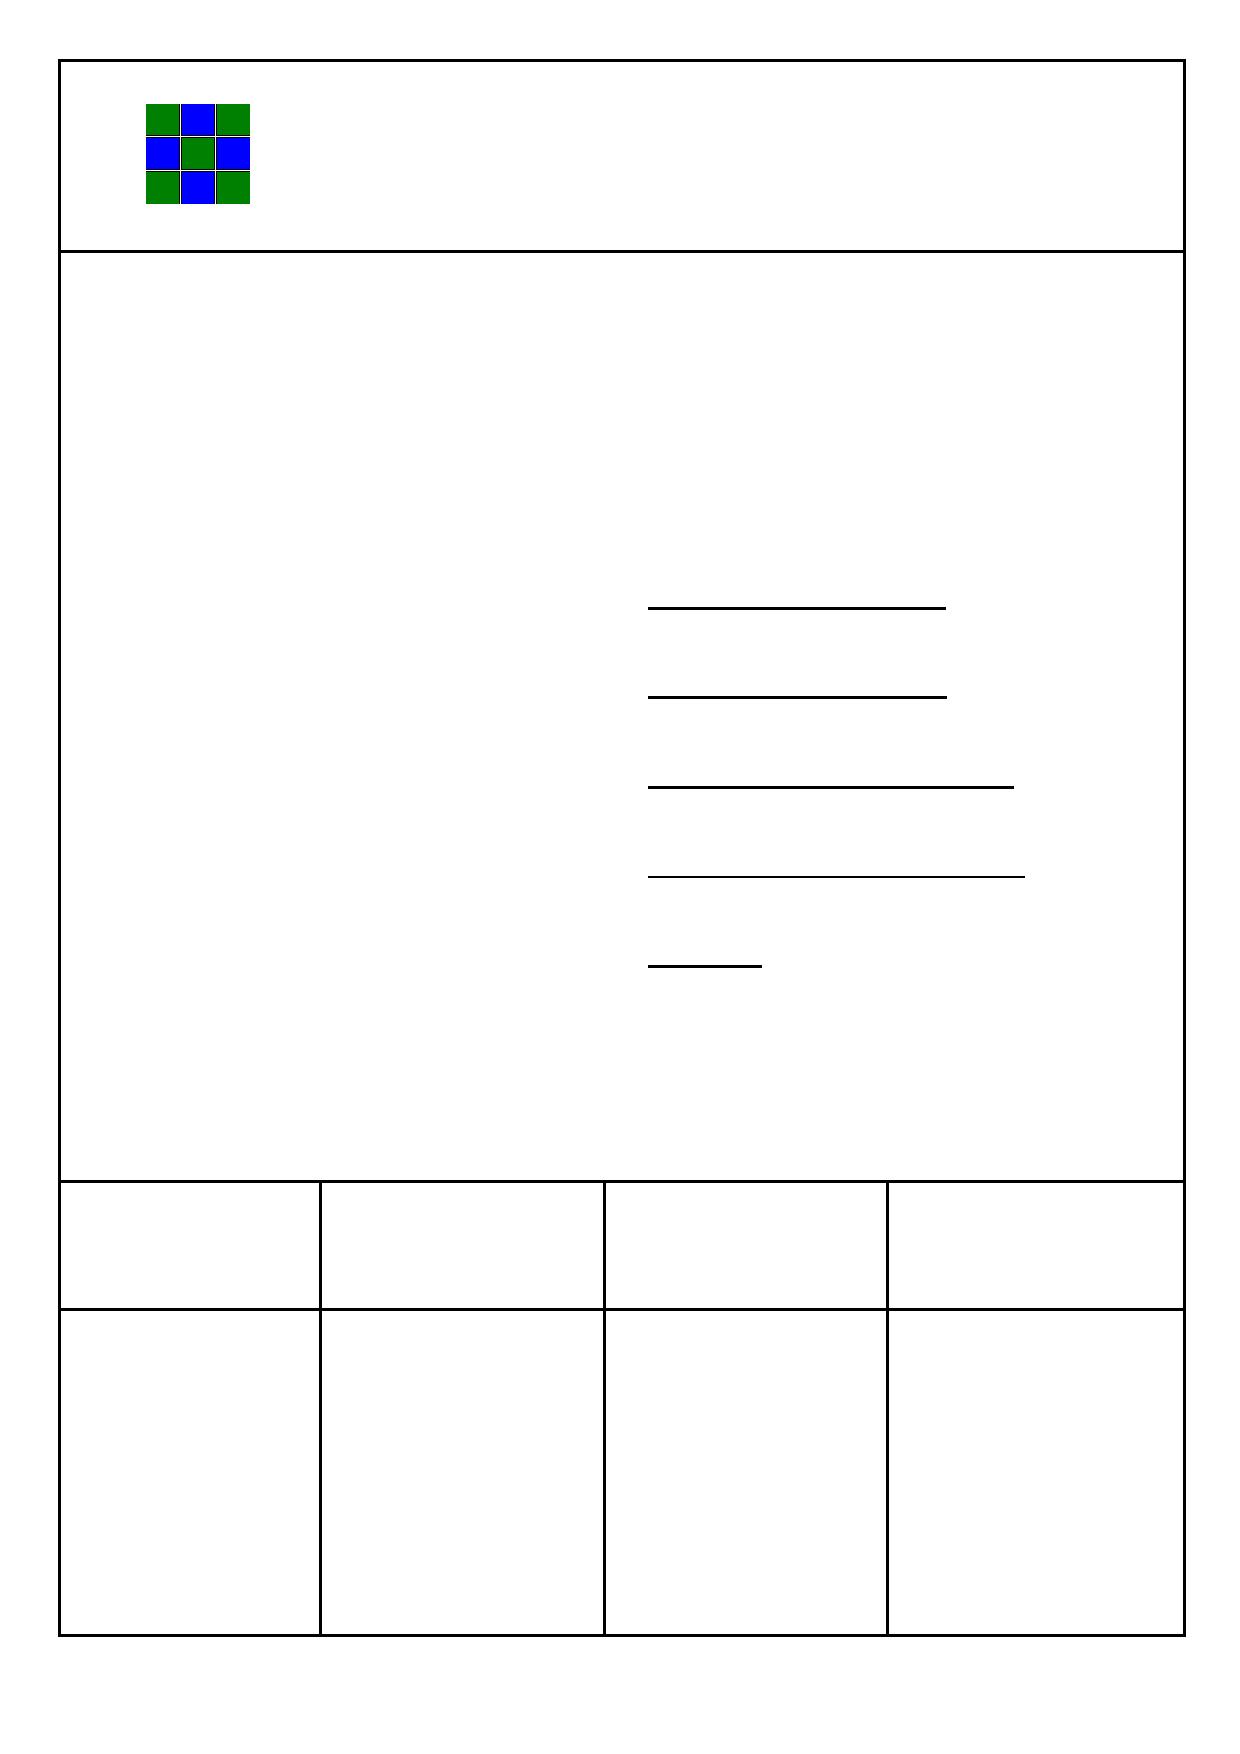 PE12864LRU-004-H 데이터시트 및 PE12864LRU-004-H PDF